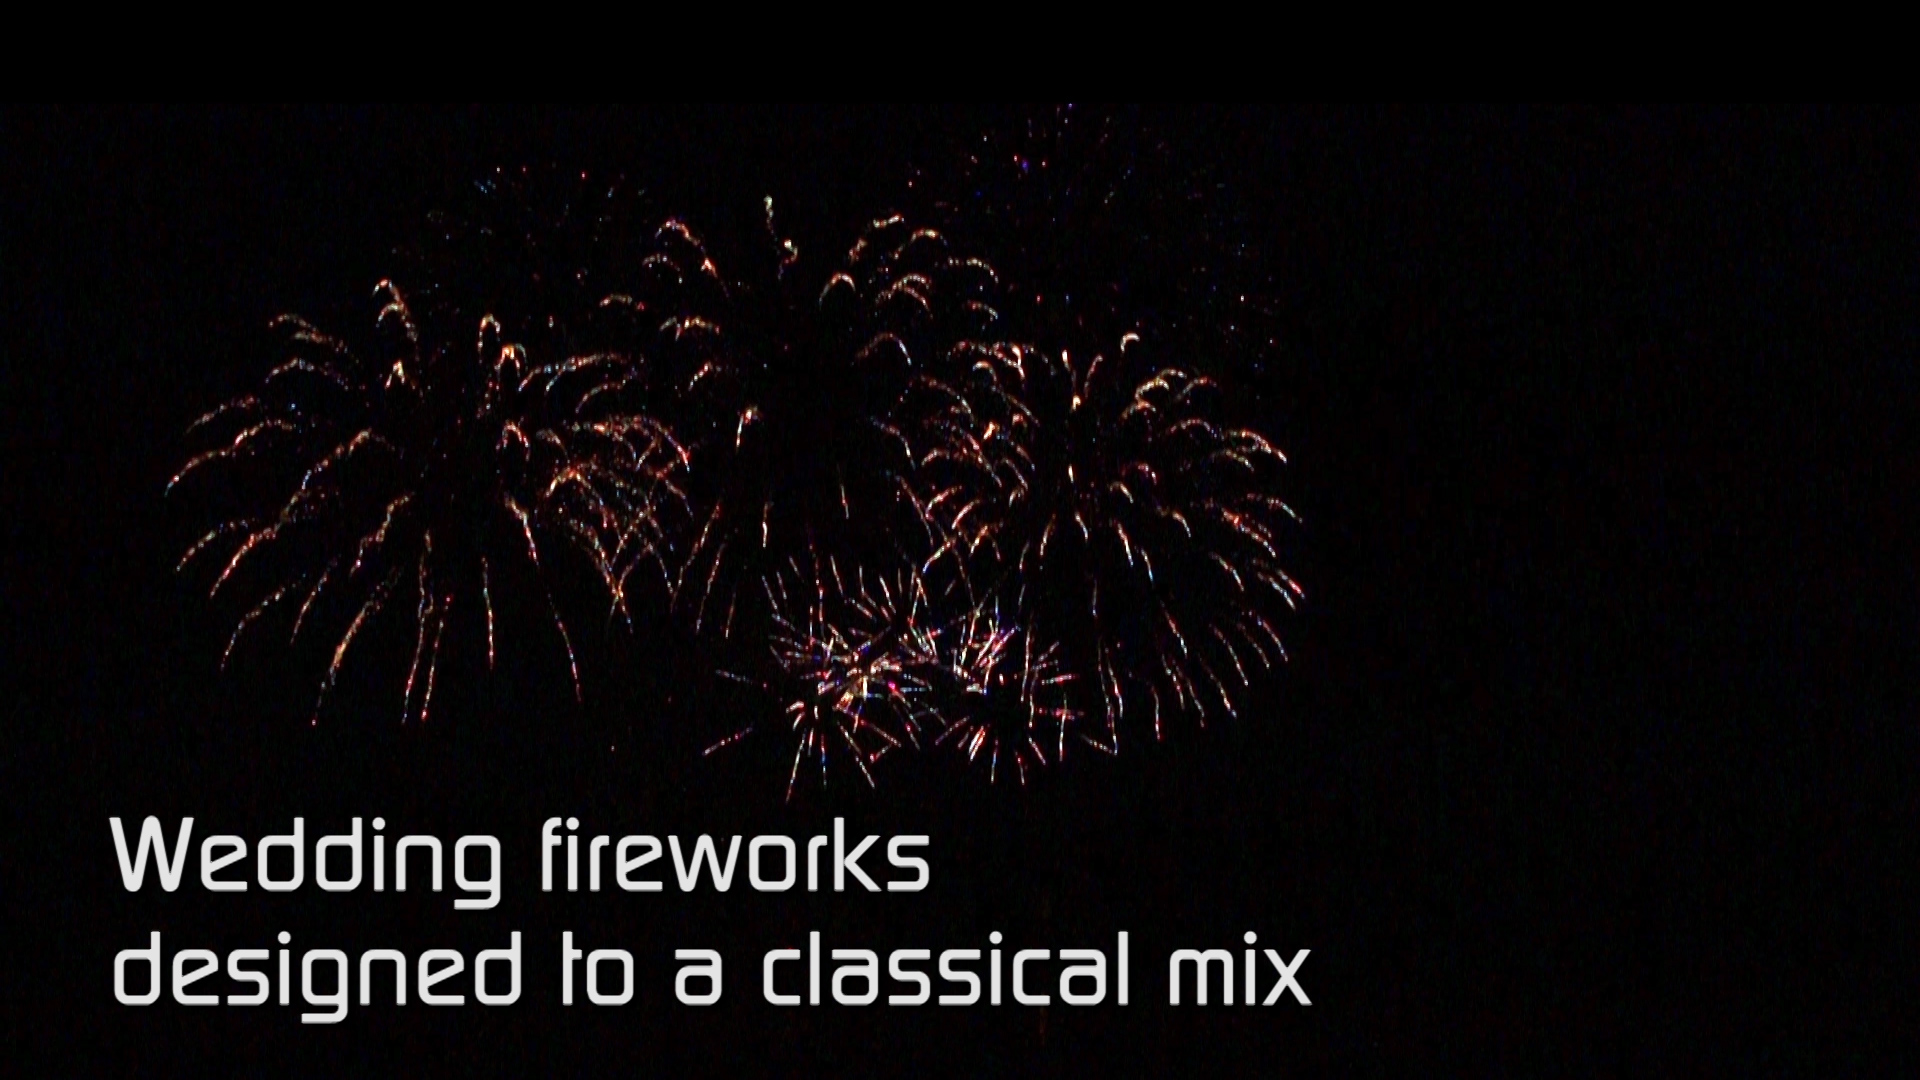 Professional Fireworks Displays | Wedding Fireworks Blenheim Palace